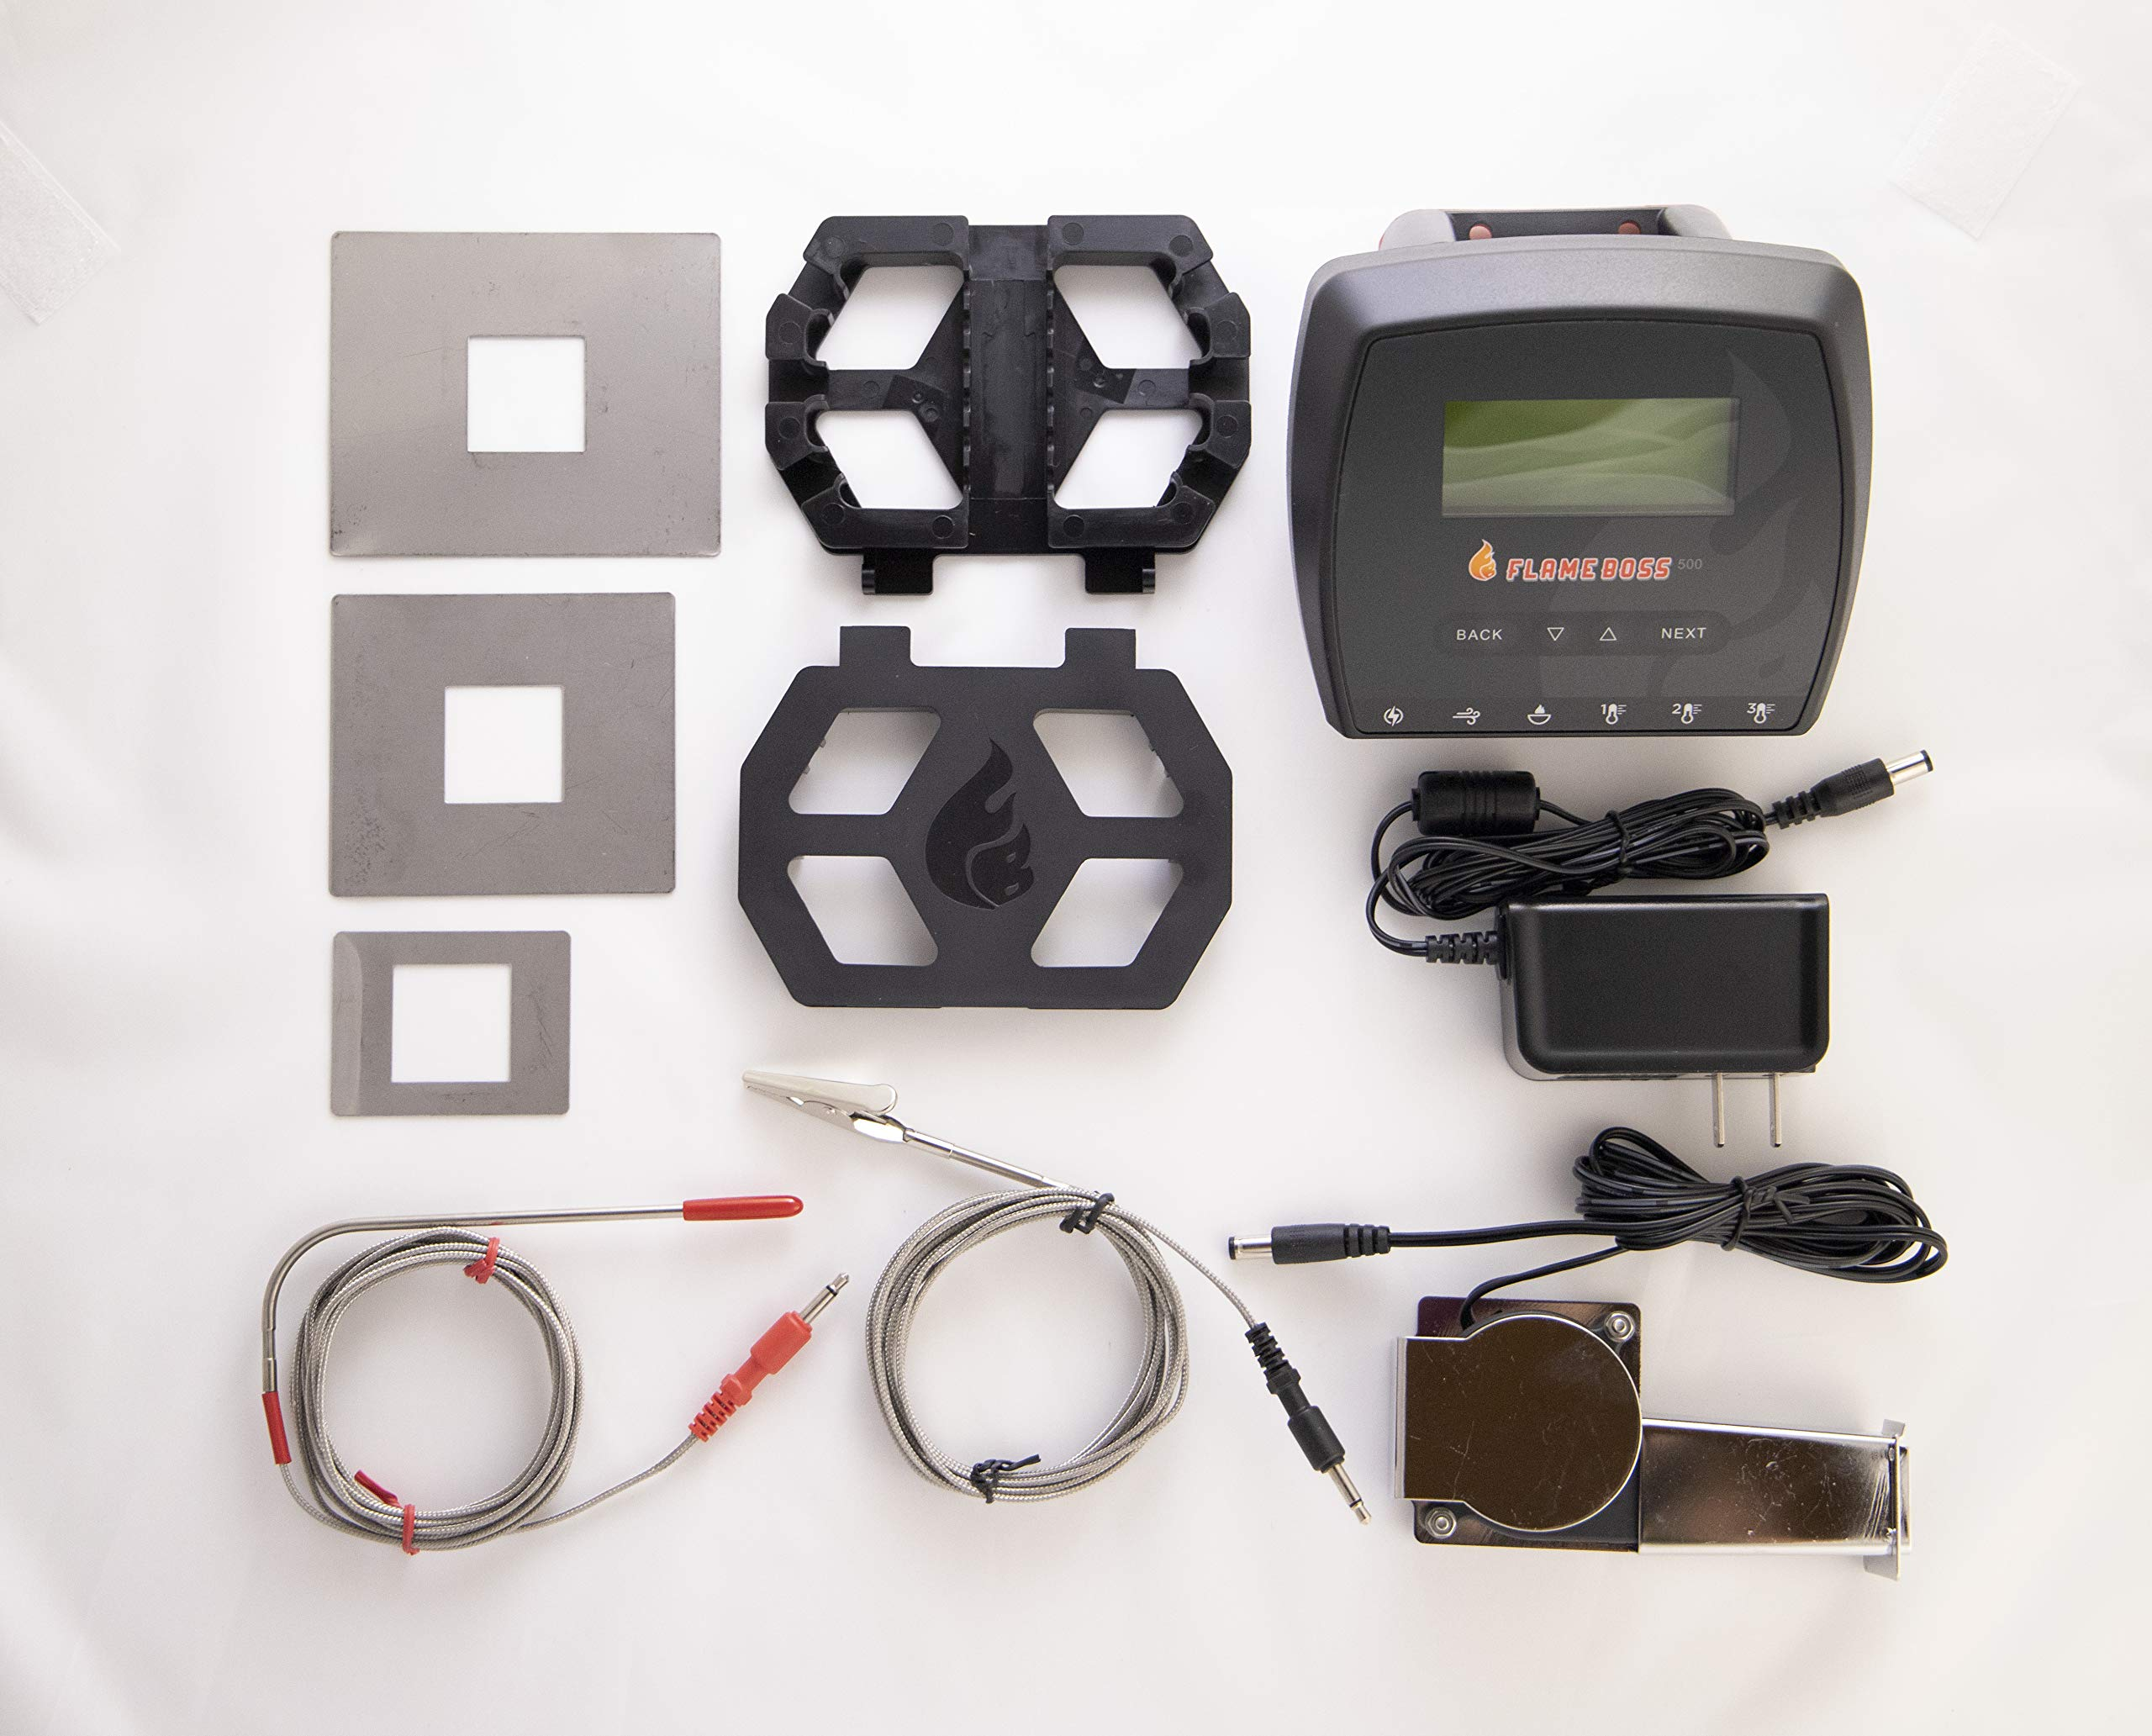 Flame Boss 500-WiFi Smoker Controller (Kamado) by Flame Boss (Image #2)